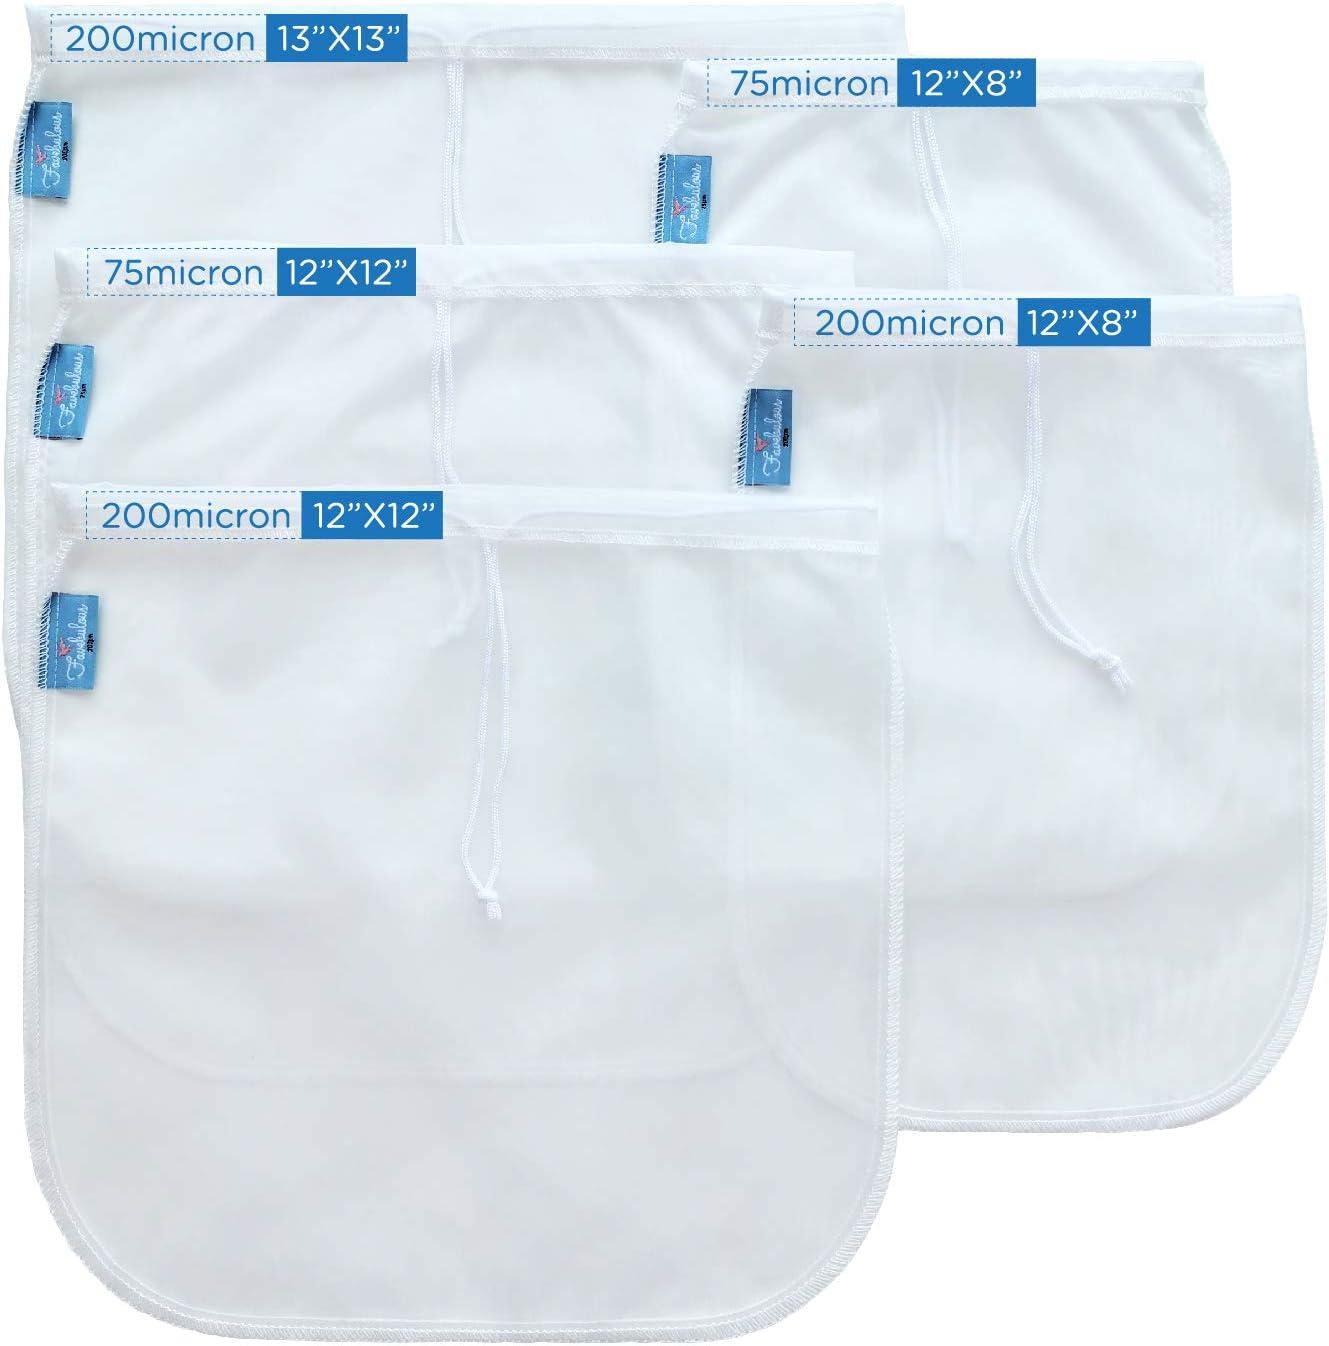 5 Multi Pack Premium Nut Milk Bag - 75&200 Micron - Durable Reusable Ultra Fine Mesh Nylon Cheesecloth Strainer For Cold Brew Coffee Tea Almond/Soy Milk Yogurt Beer Celery Juice - Food Grade BPA Free